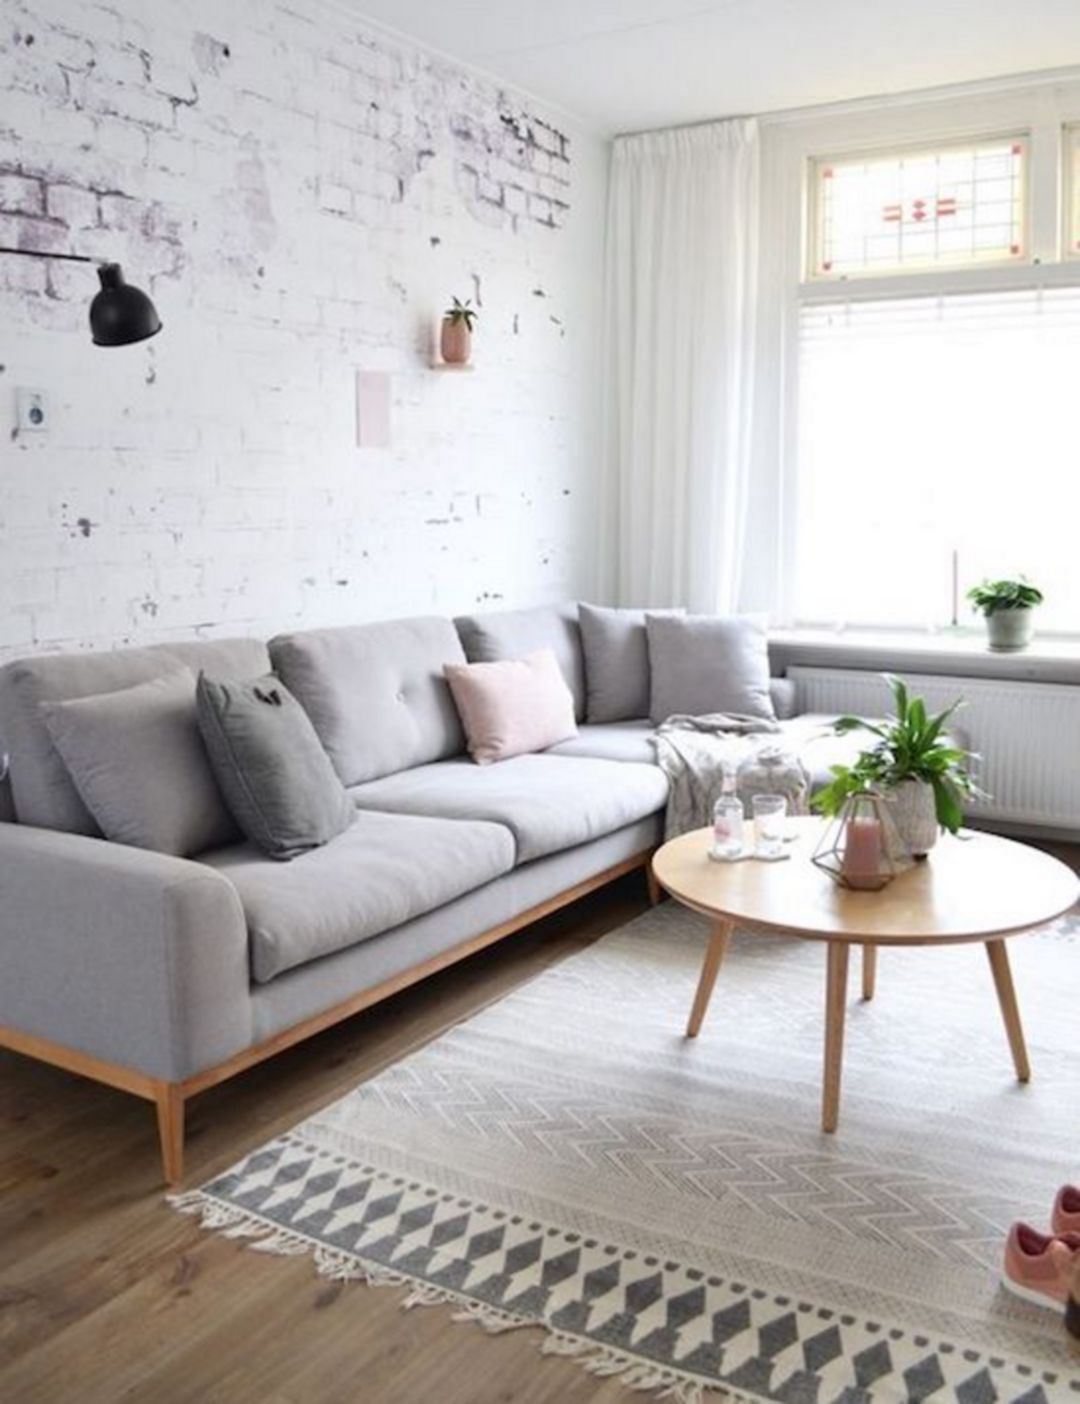 52 Beautiful Minimalist Home Decor On A Budget Living Room